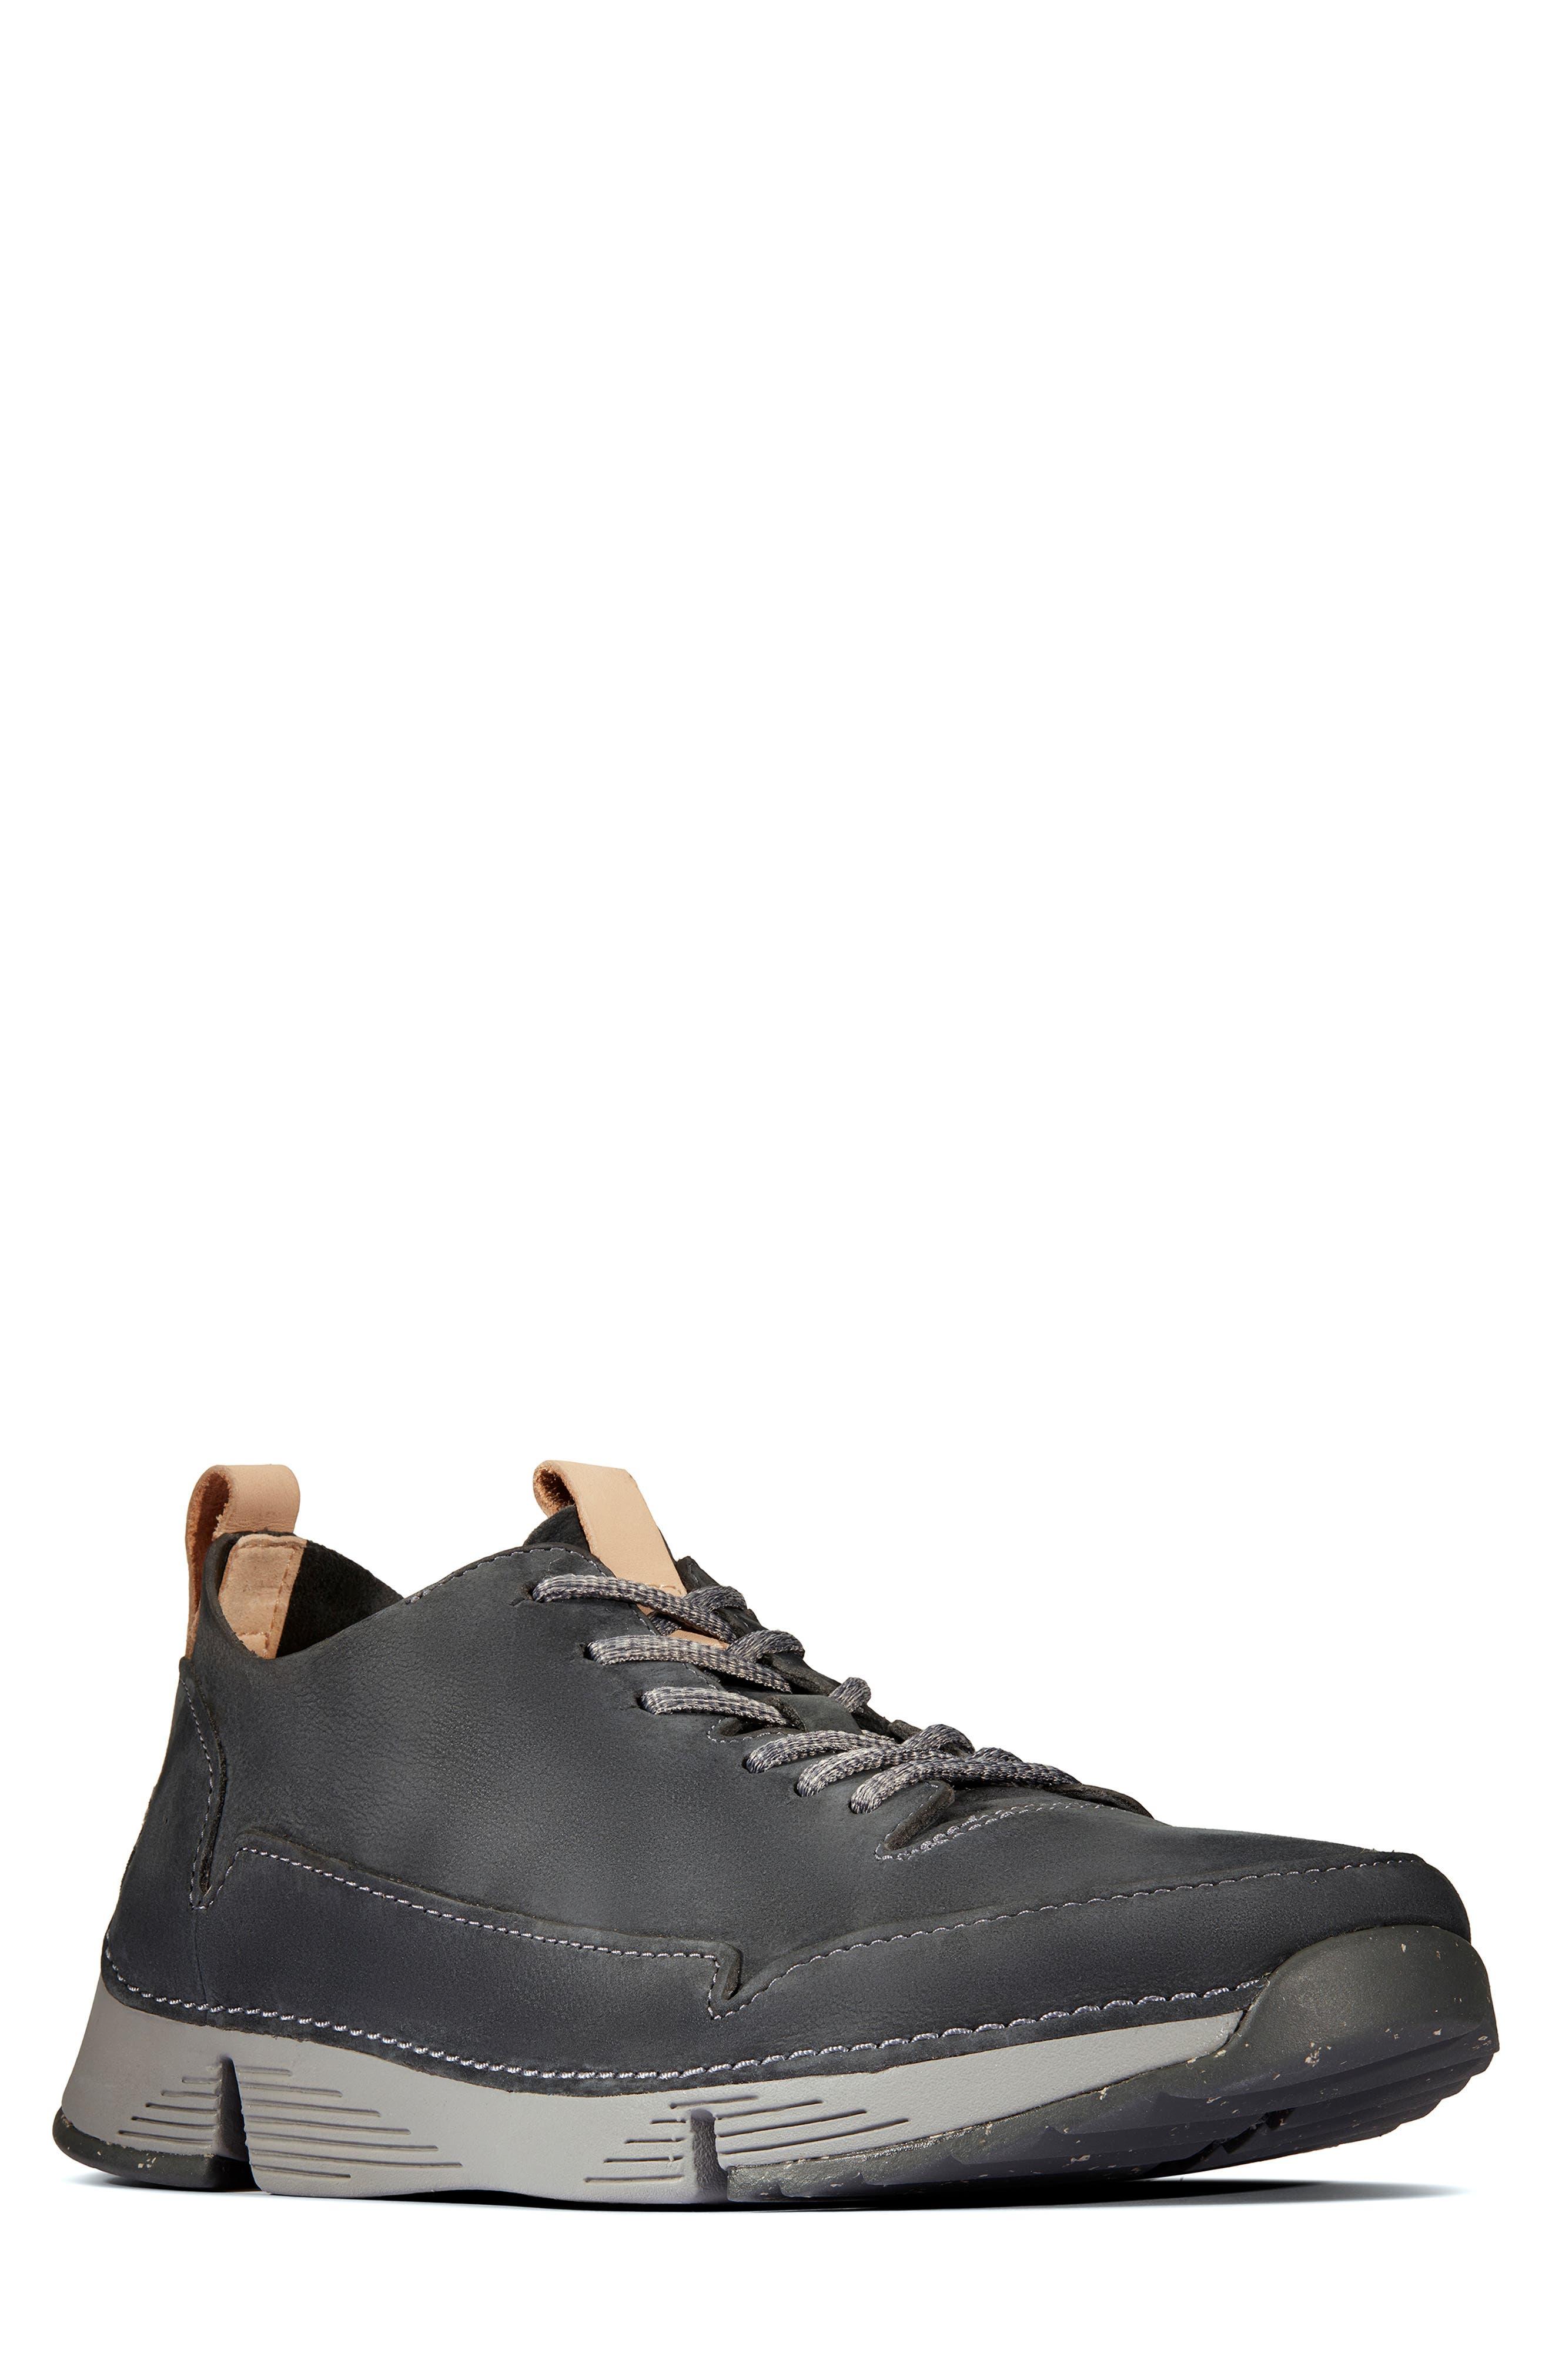 Tri Active Run Sneaker,                             Main thumbnail 1, color,                             GREY LEATHER